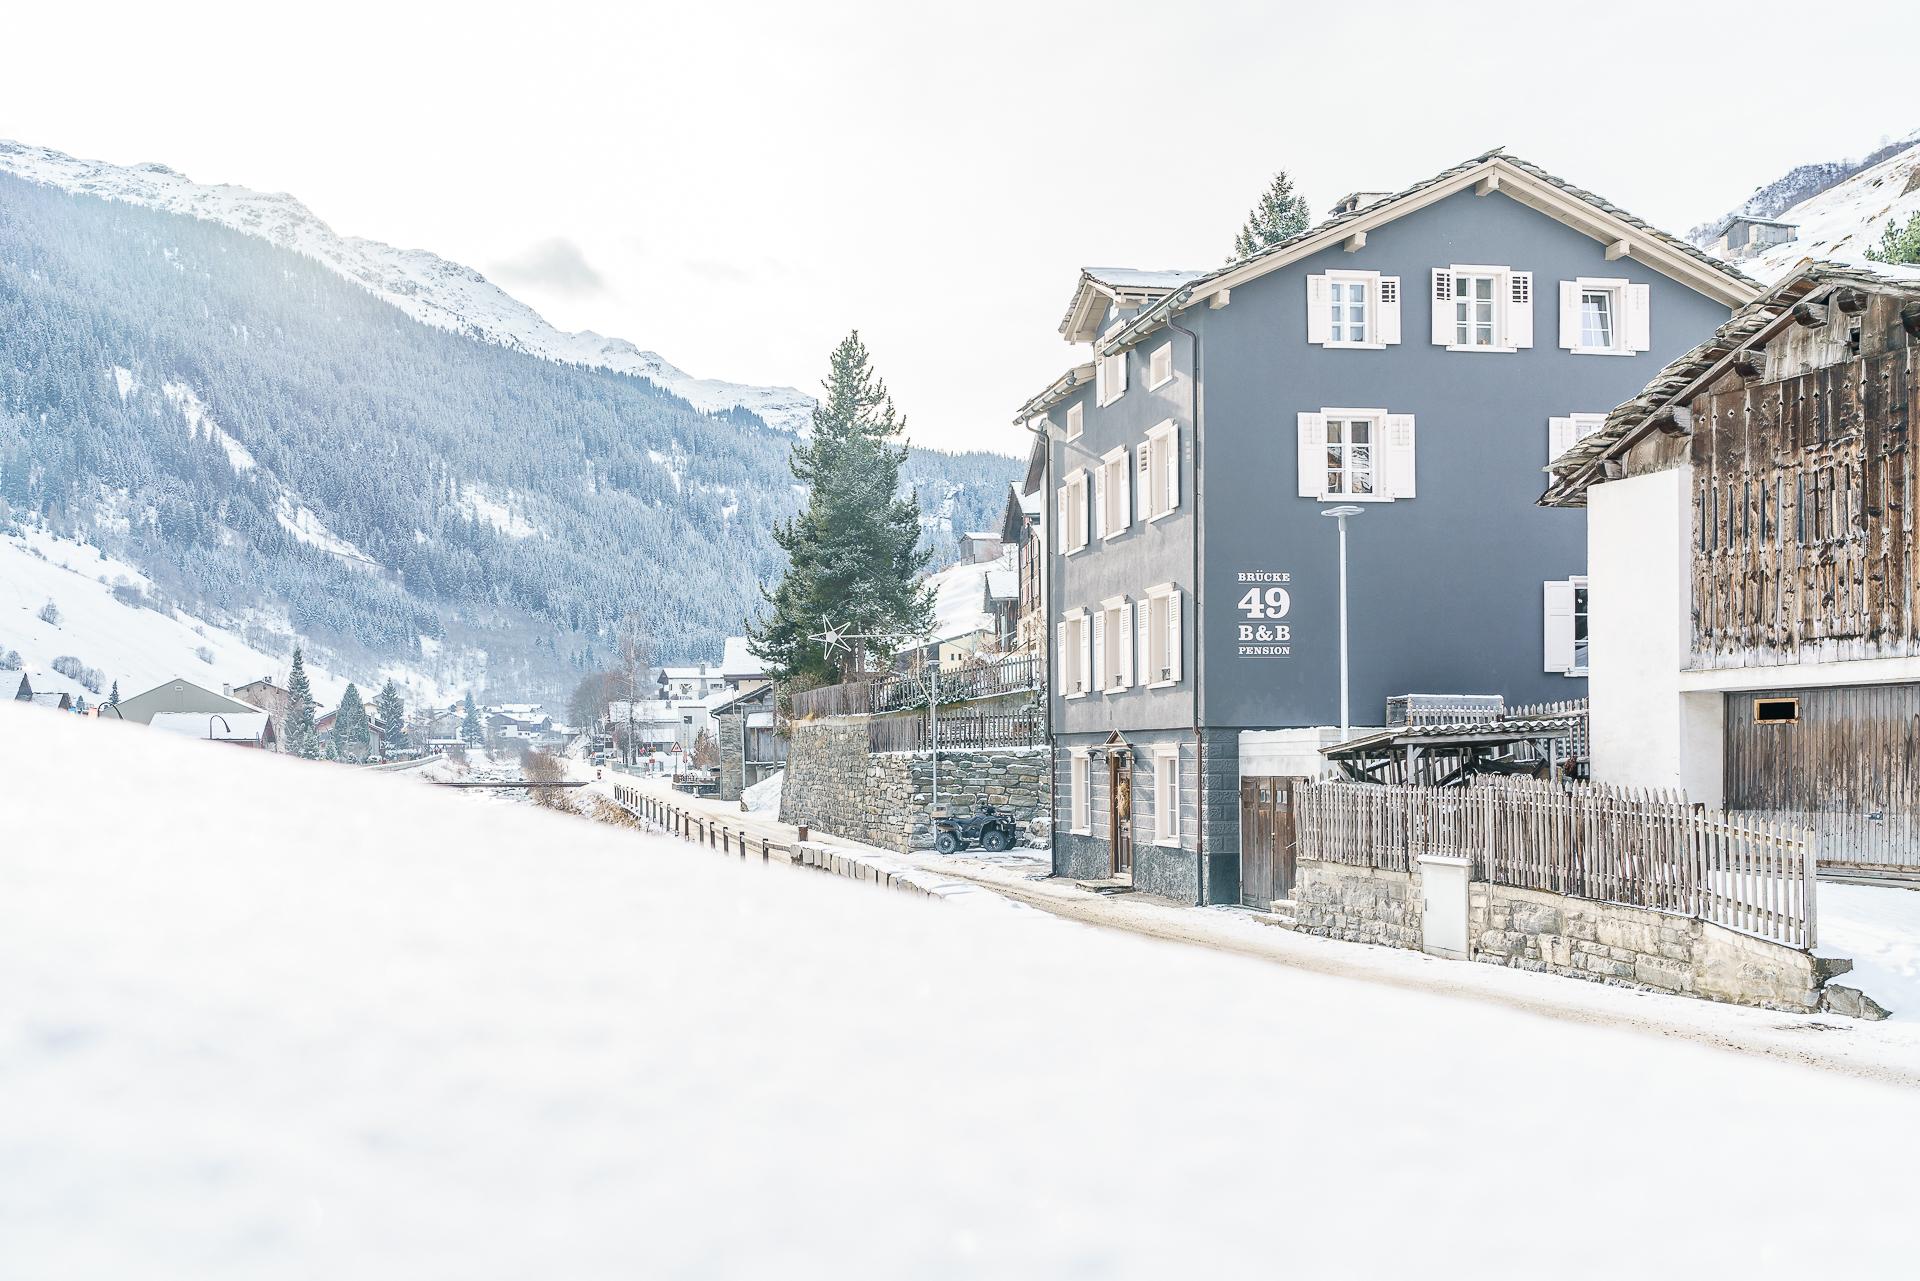 Bruecke-49-Vals-White-Line-Hotels